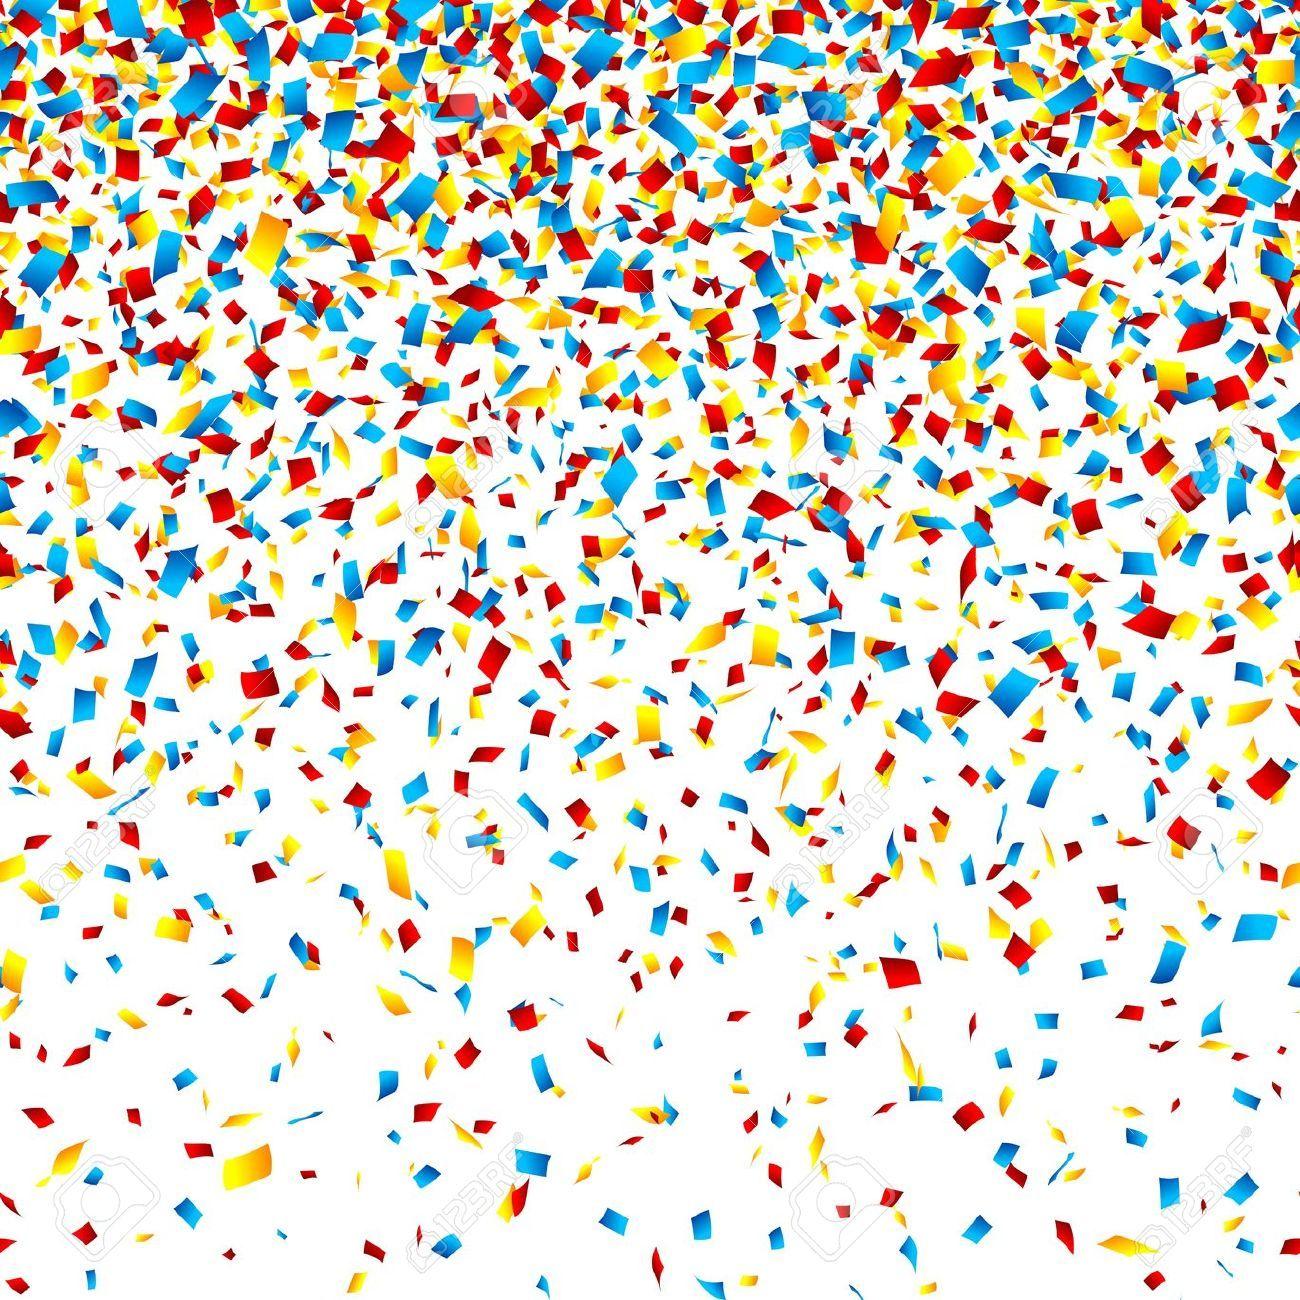 Background clipart confetti. Stock vector illustration and